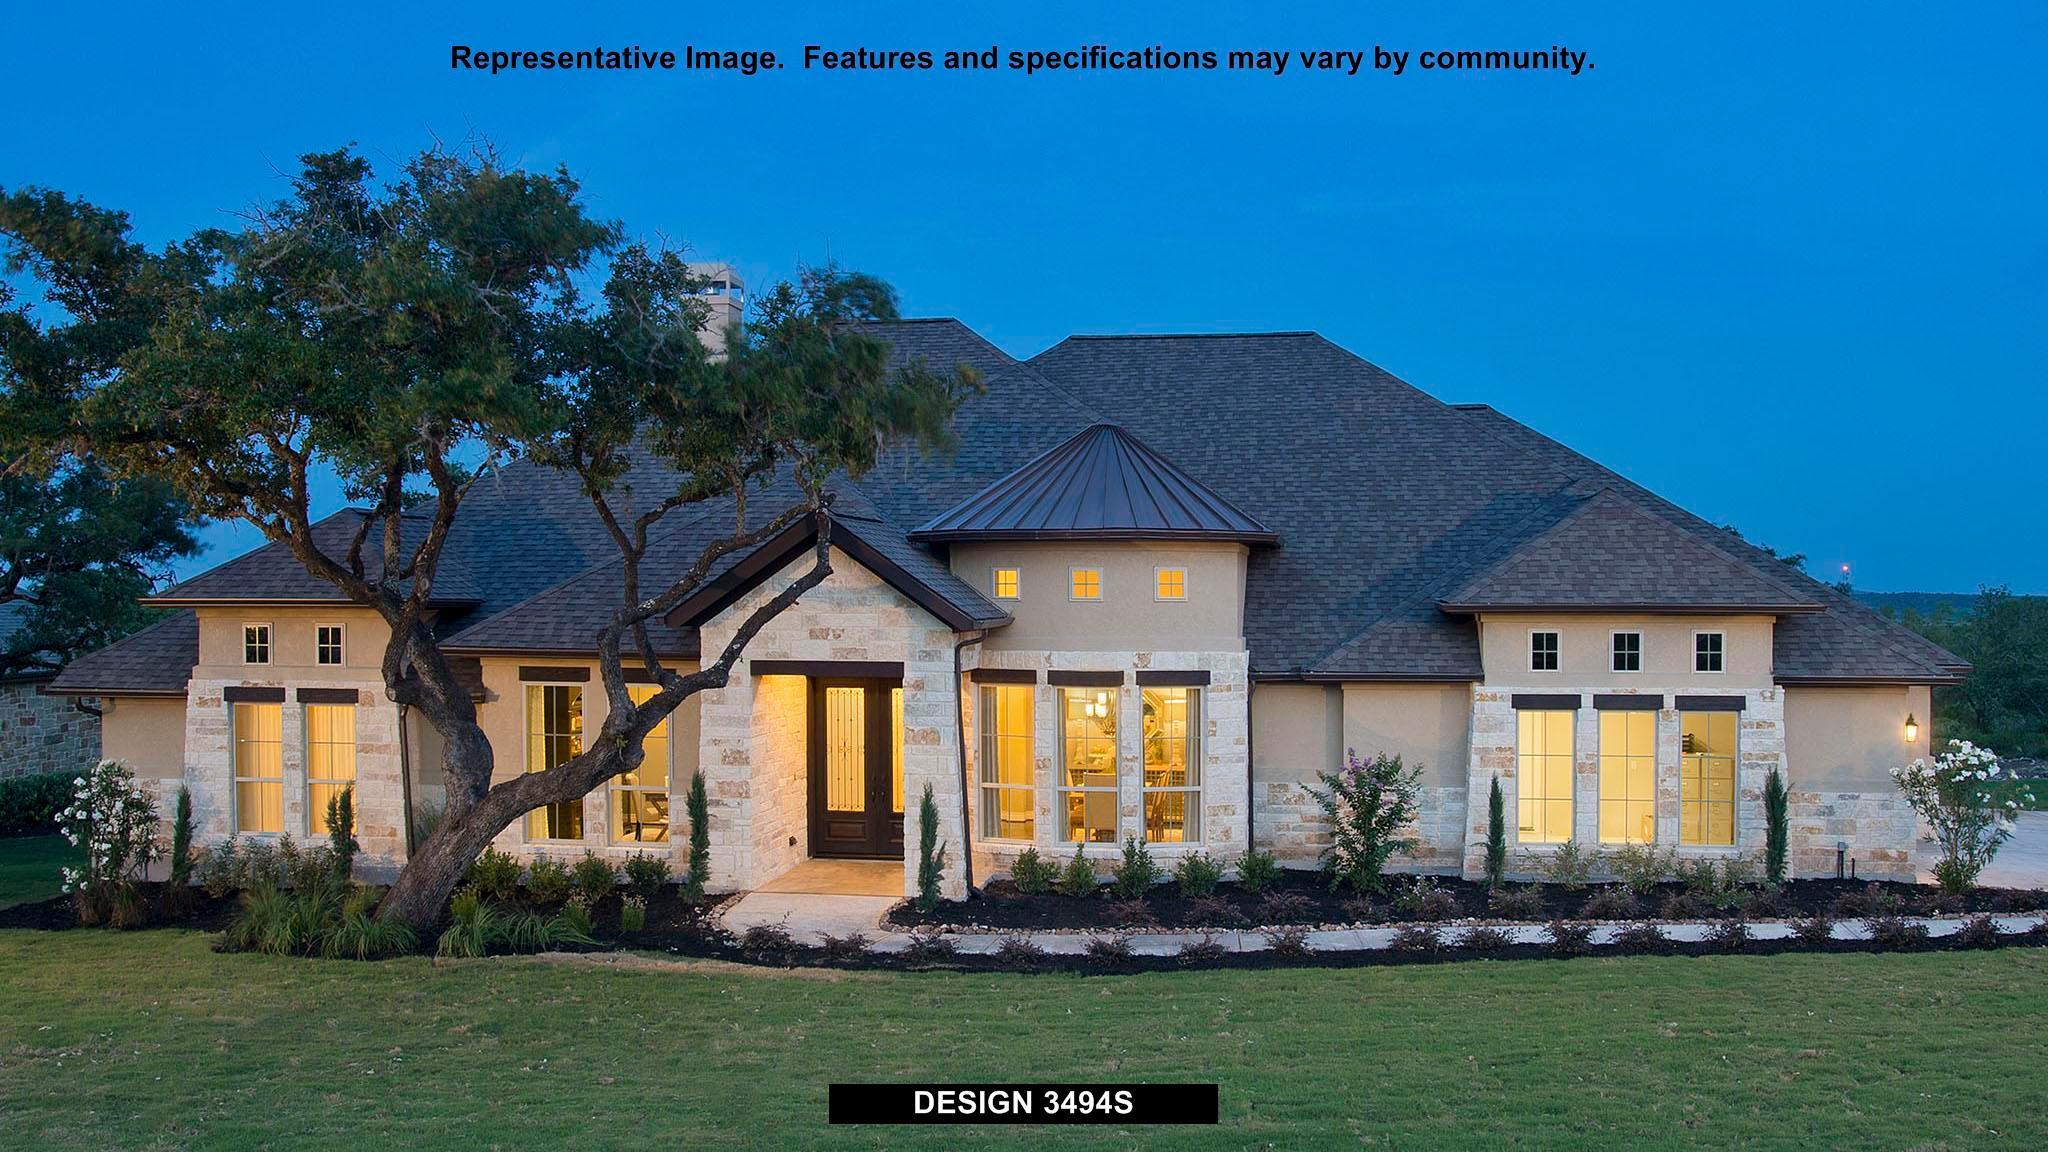 Single Family for Sale at Balcones Creek Half Acre - 3494s 7986 Cibolo View Fair Oaks Ranch, Texas 78015 United States